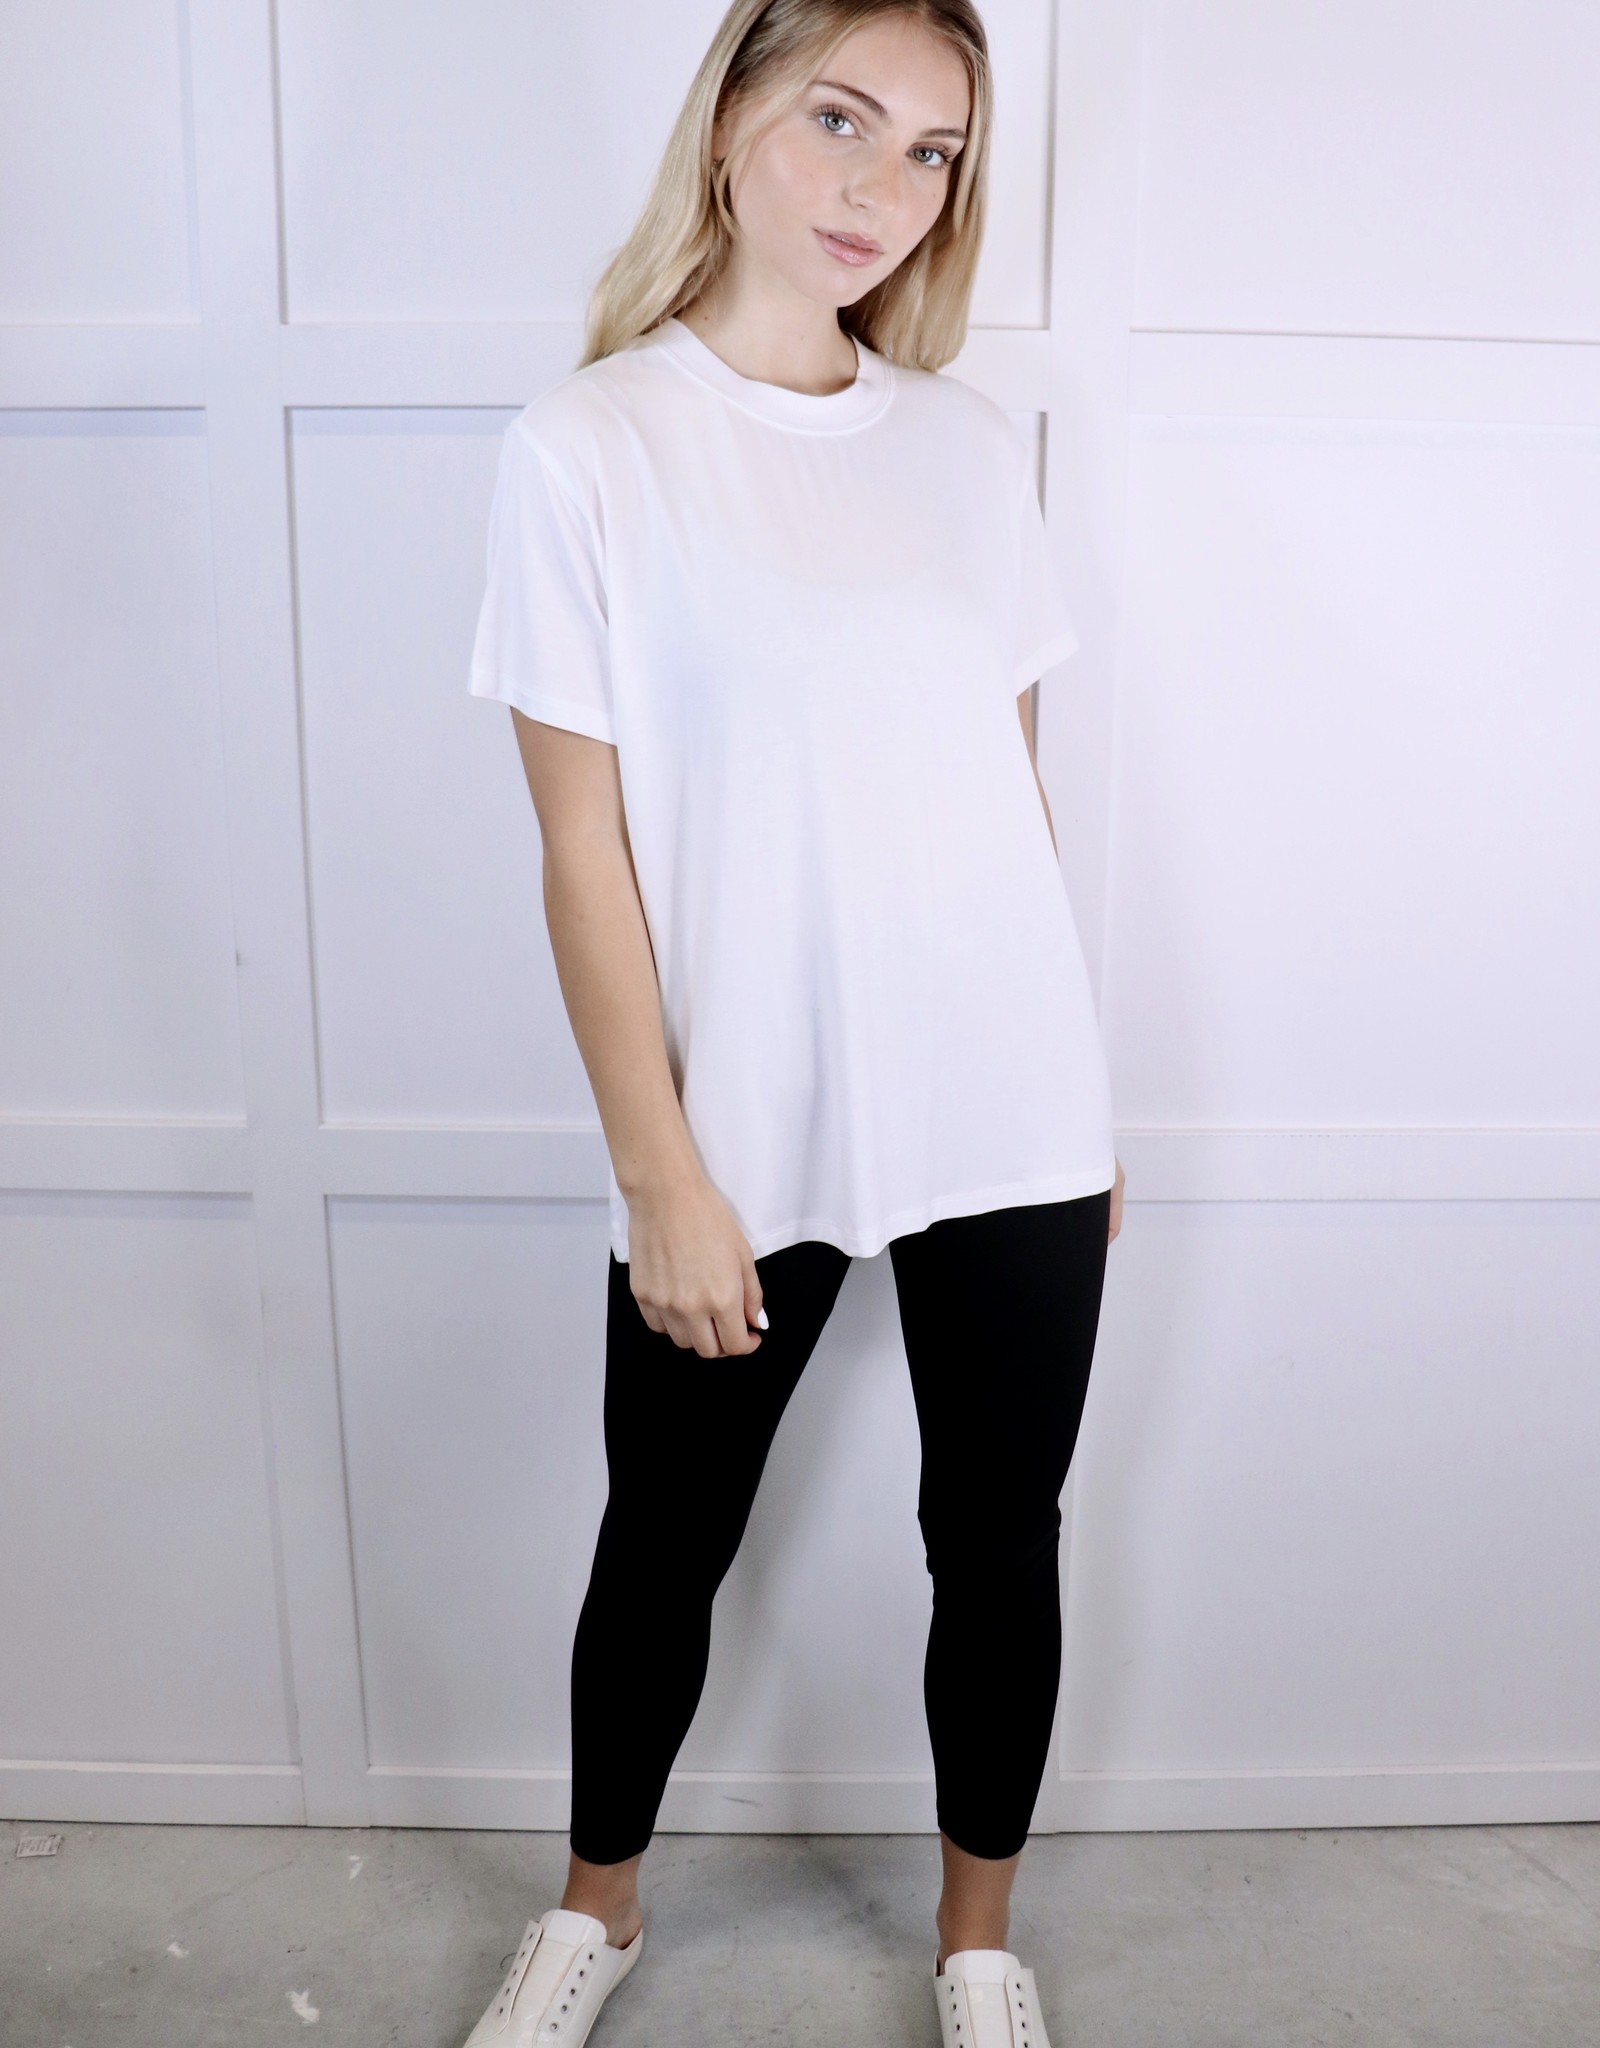 HUSH Boyfriend fit t-shirt